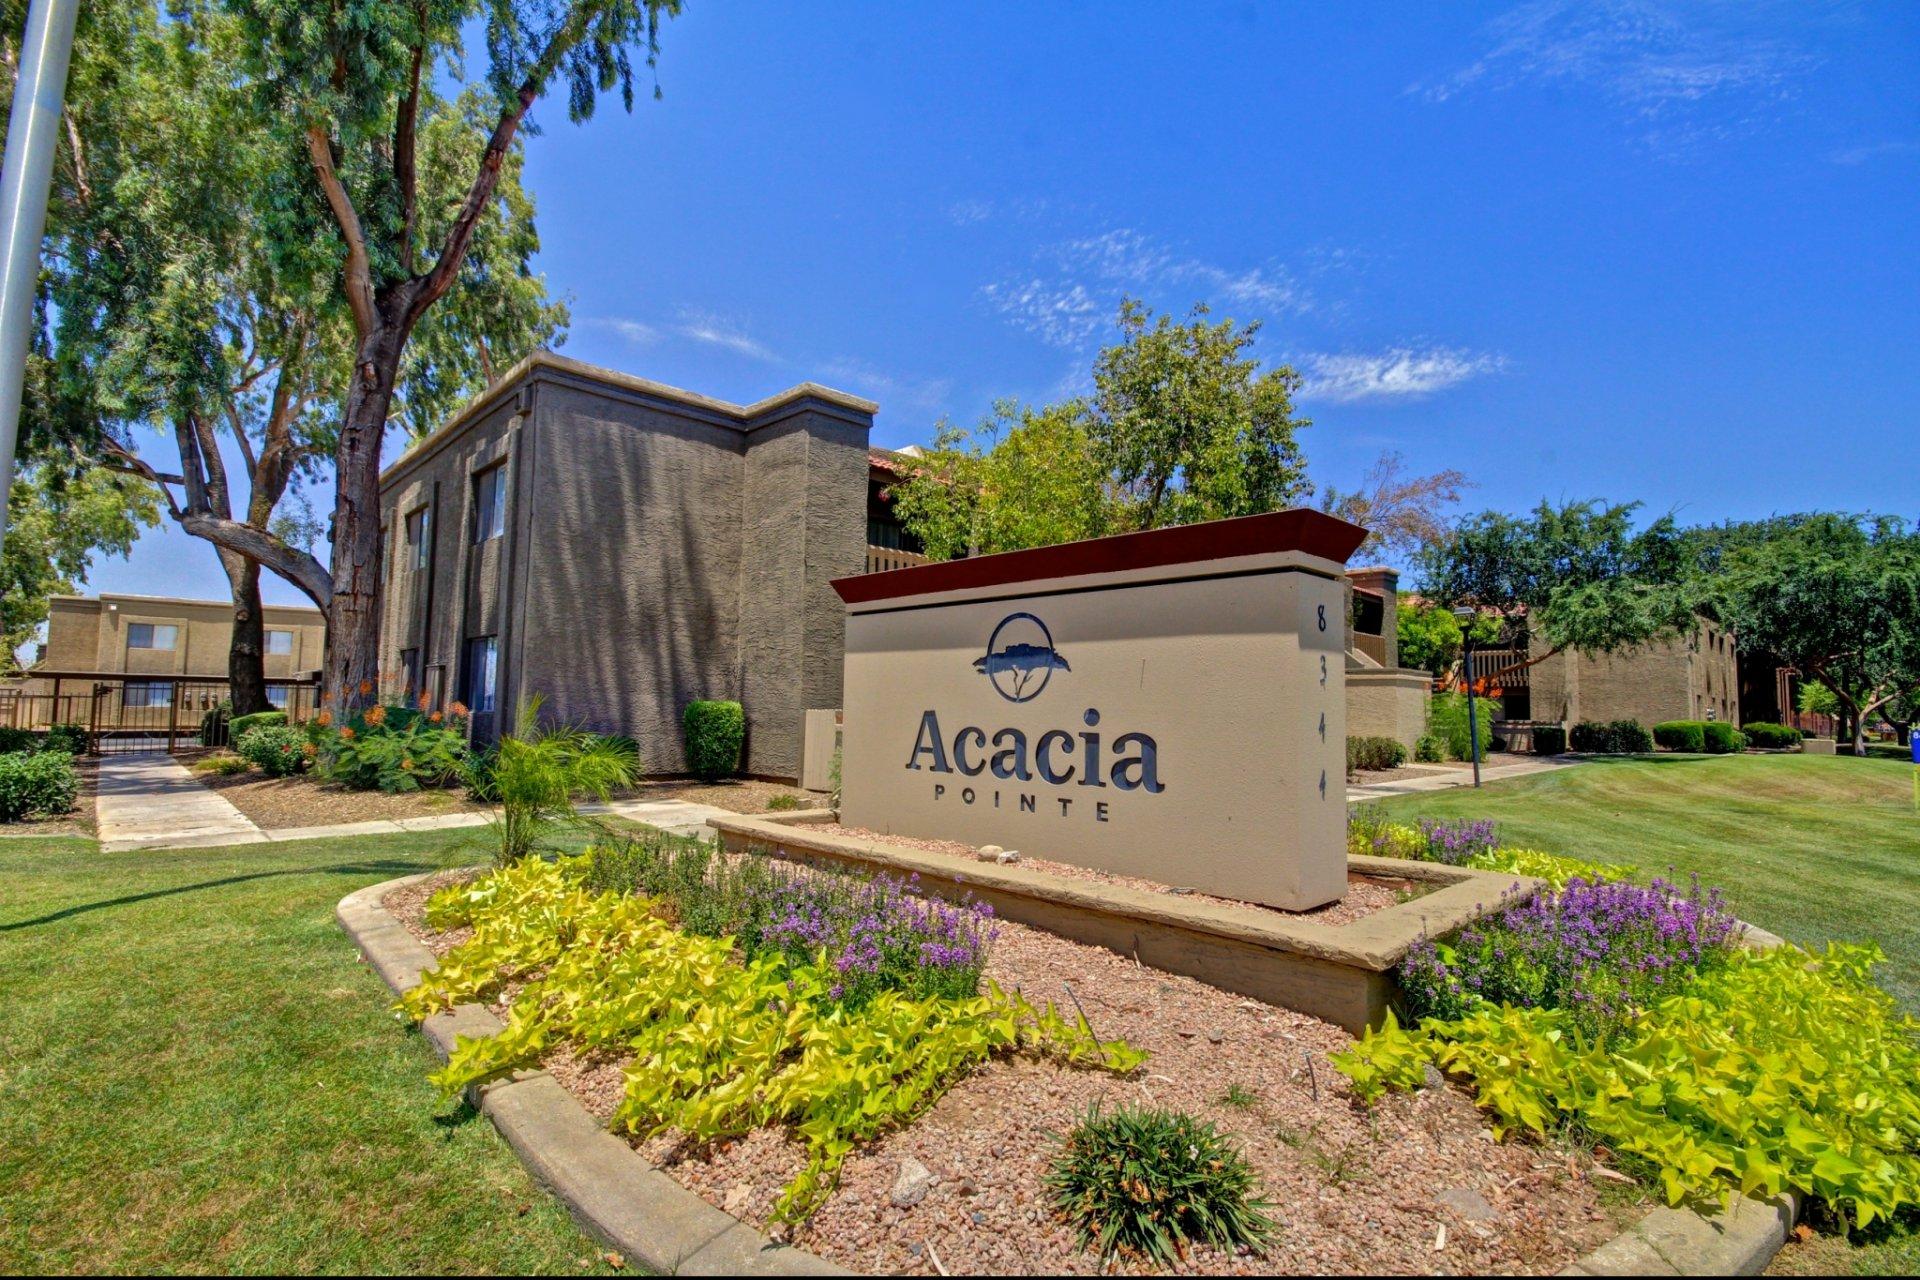 Acacia Pointe Apartments Phoenix, AZ signage